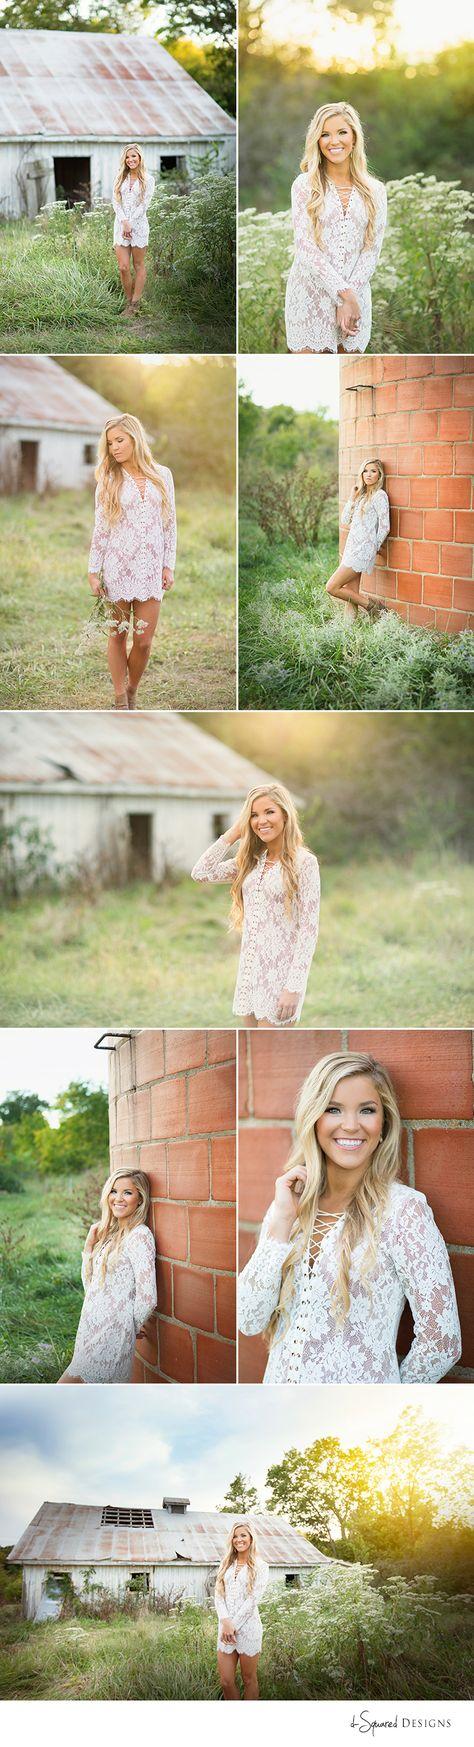 d-Squared Designs St. Louis, MO Senior Photography. Senior Photography. Beautiful girl. Country Senior Session.